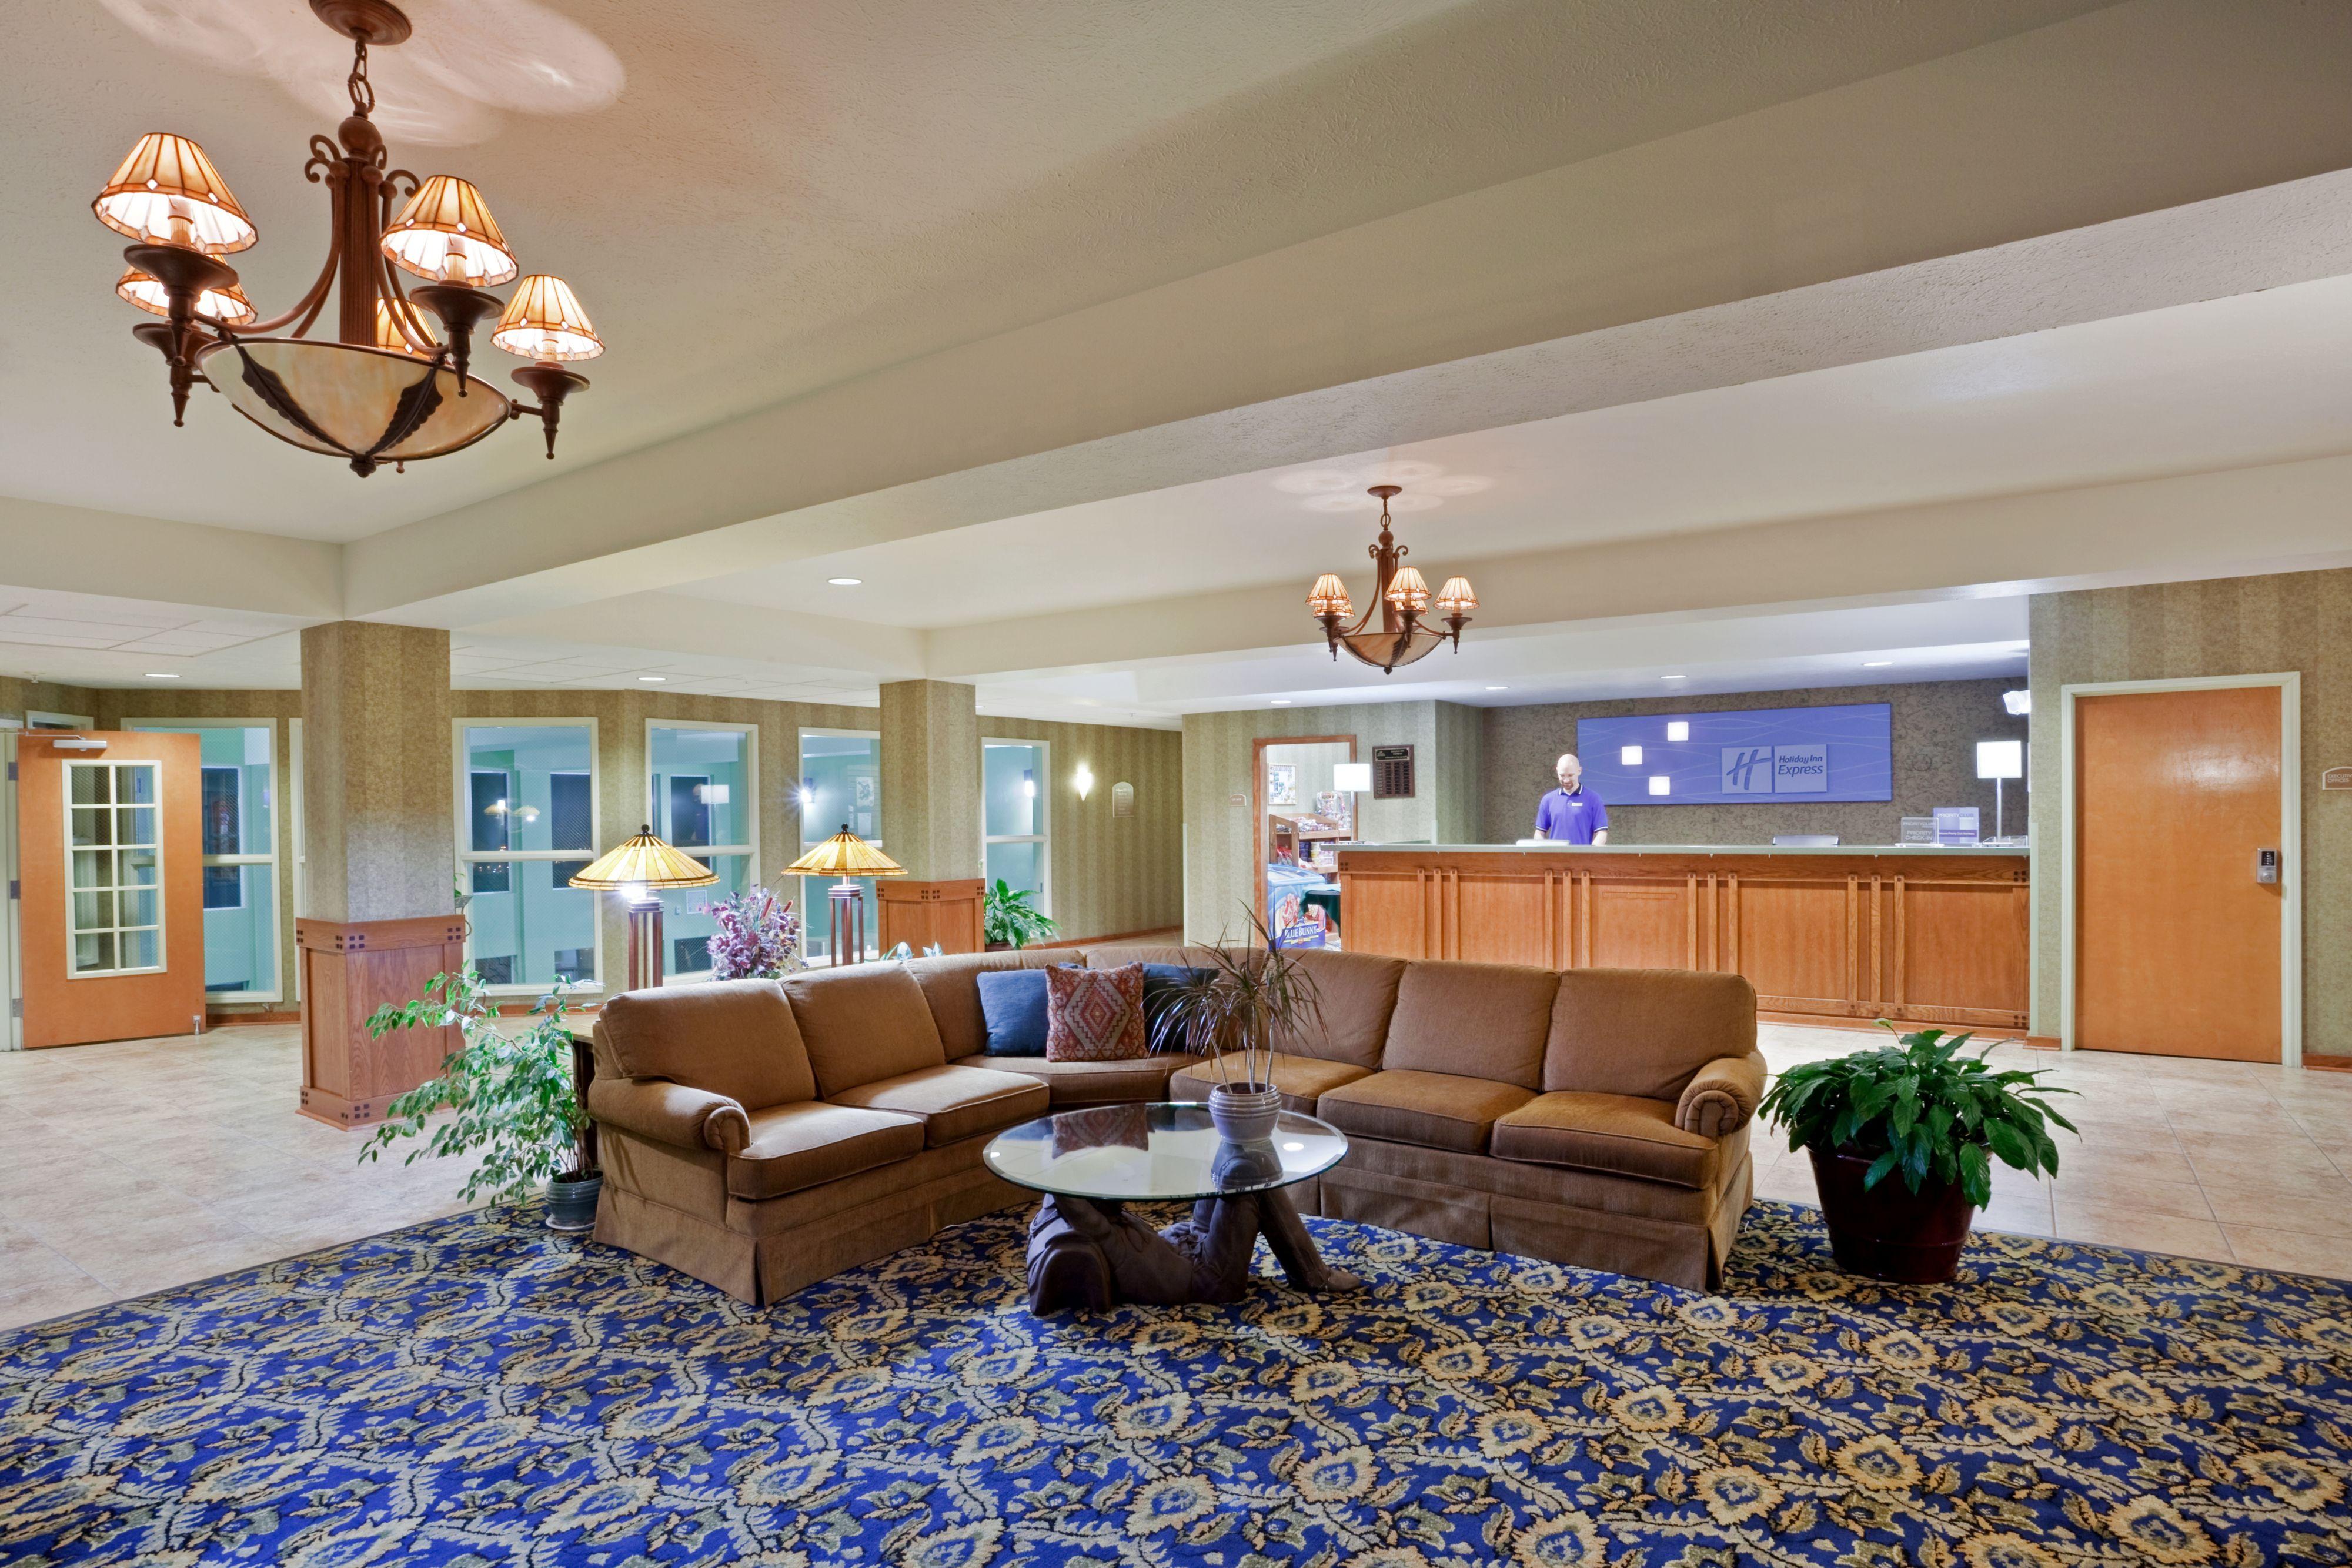 Holiday Inn Express Lewiston image 3